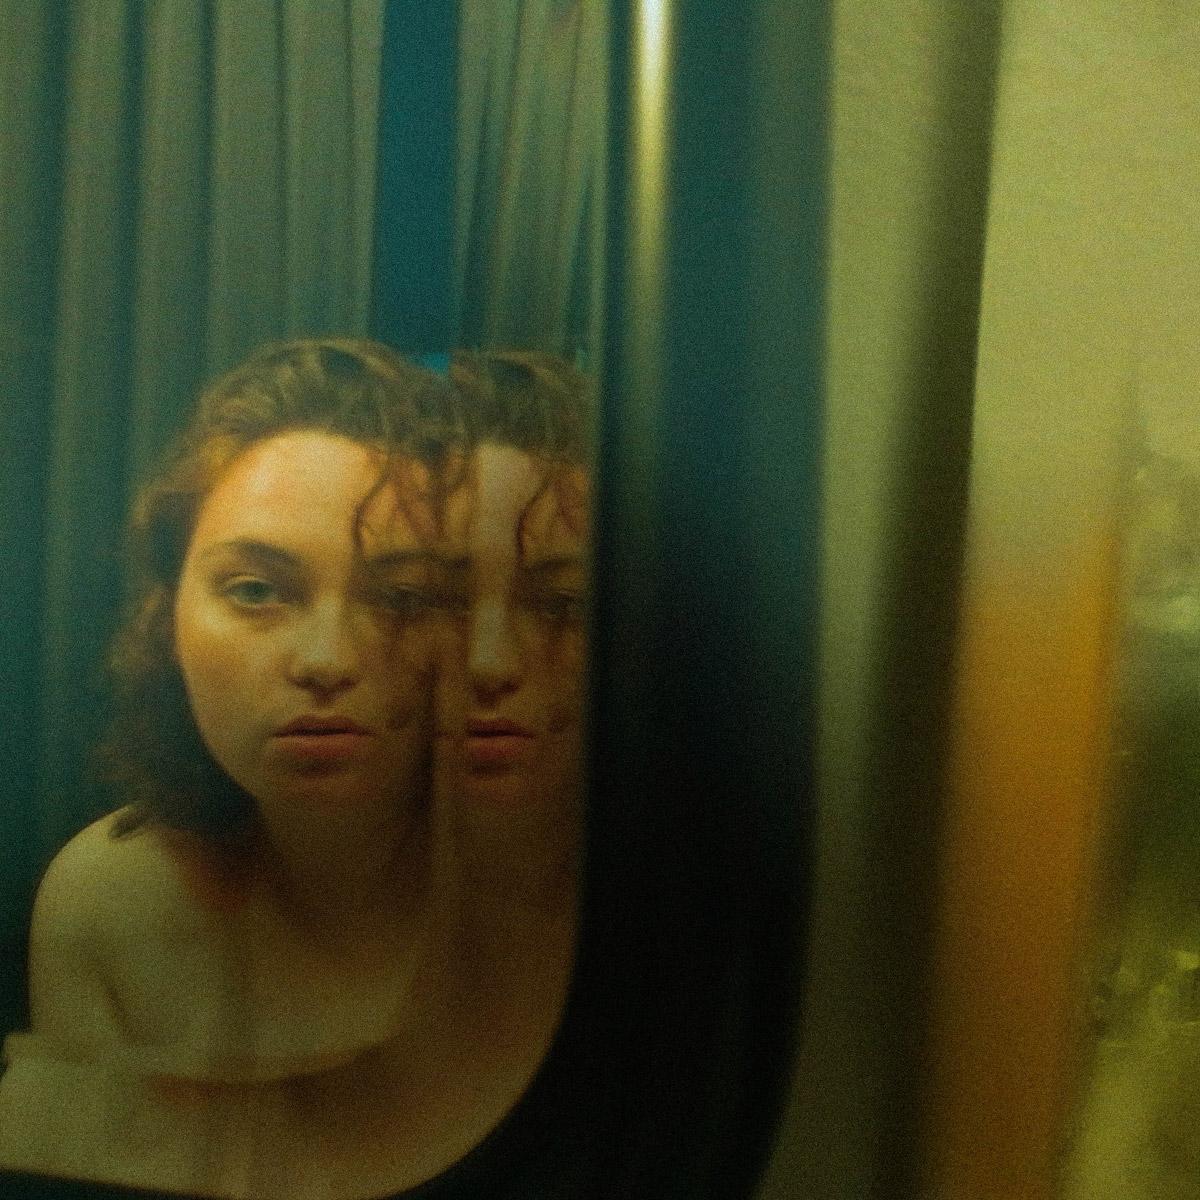 Photographer Lauren Tepfer